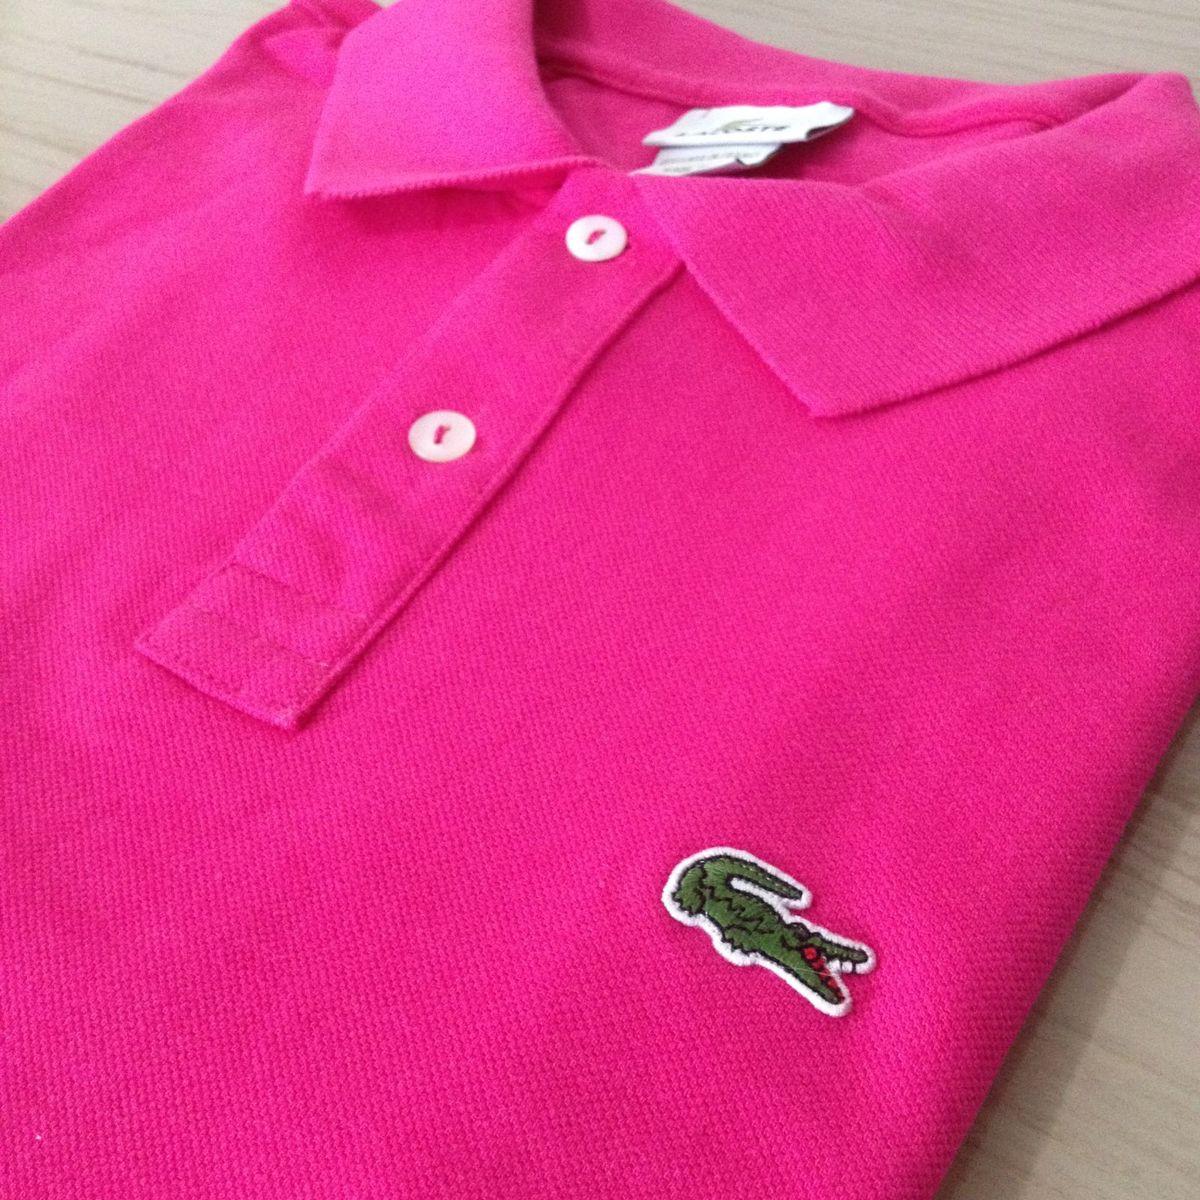 06b7ad5004fa7 camisa polo lacoste pink tam gg 7 original - camisas lacoste